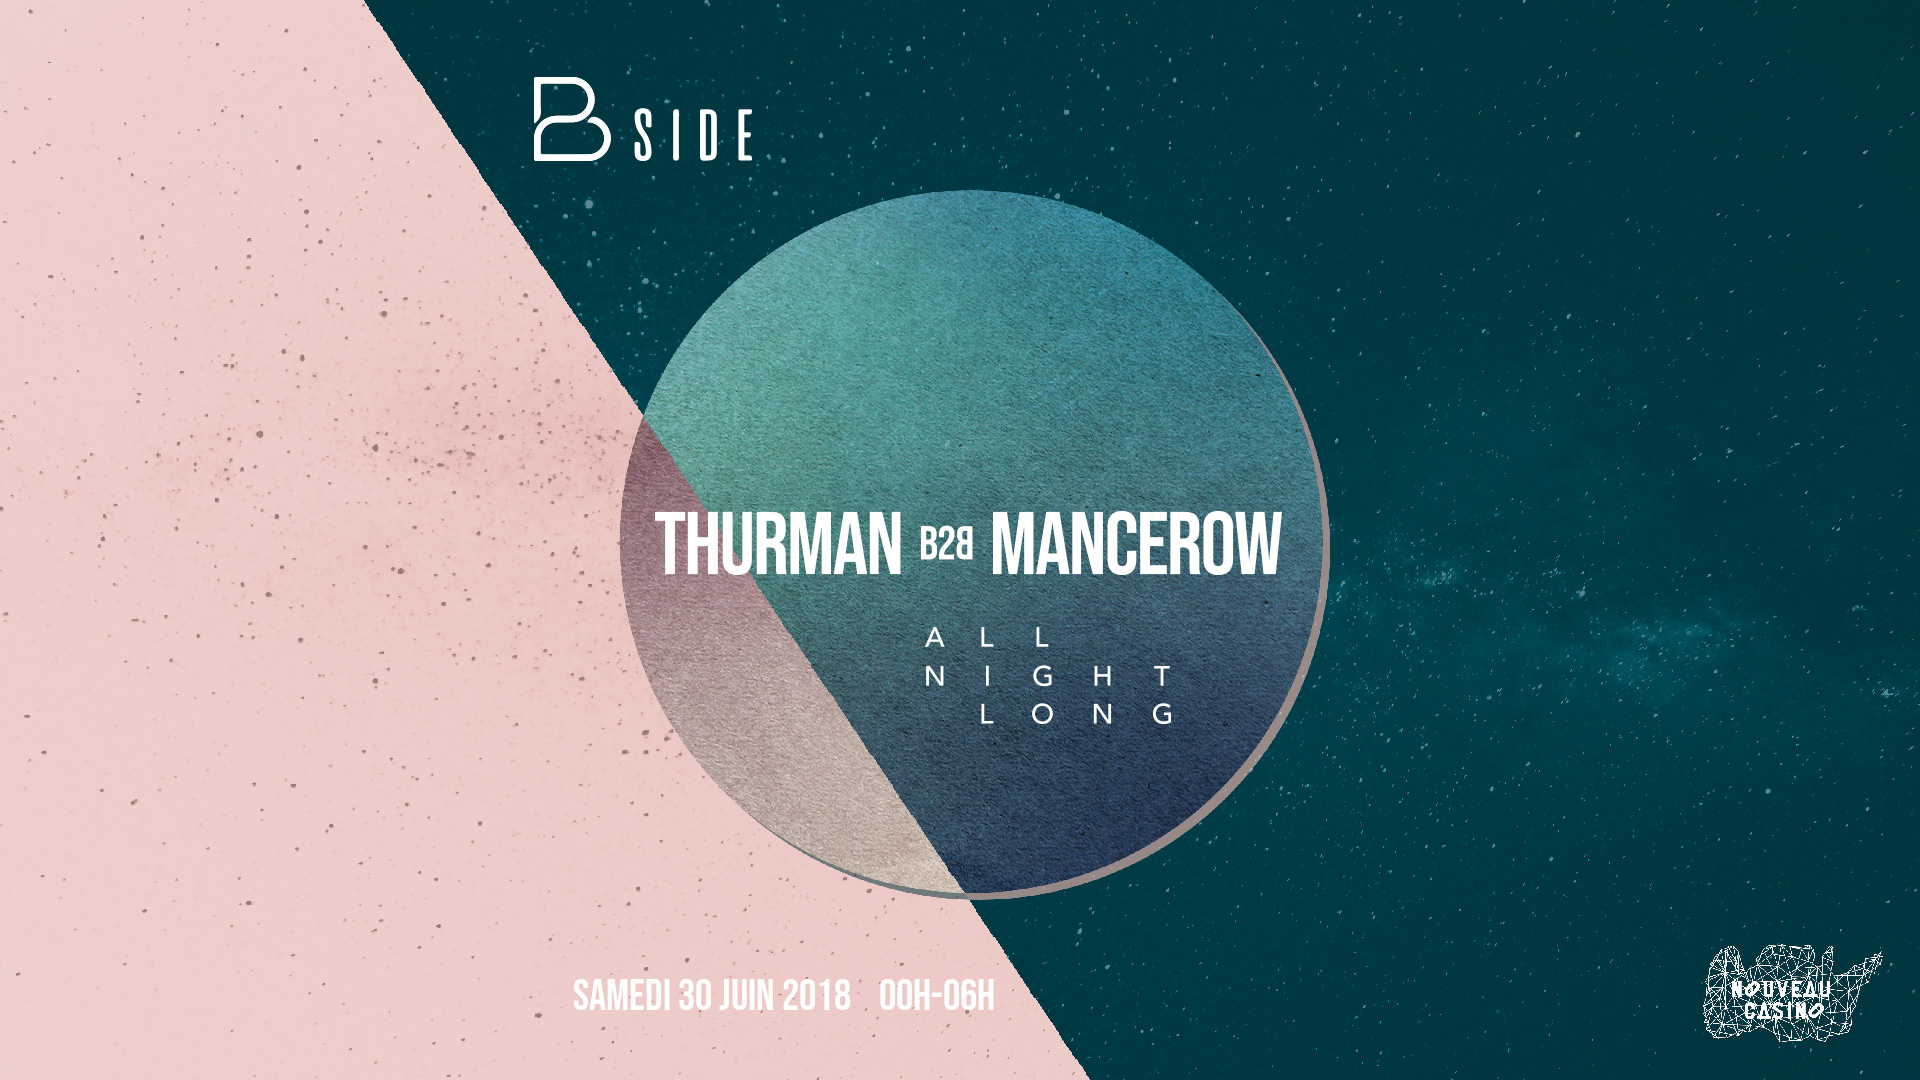 Opening : BSIDE présente Thurman b2b Mancerow